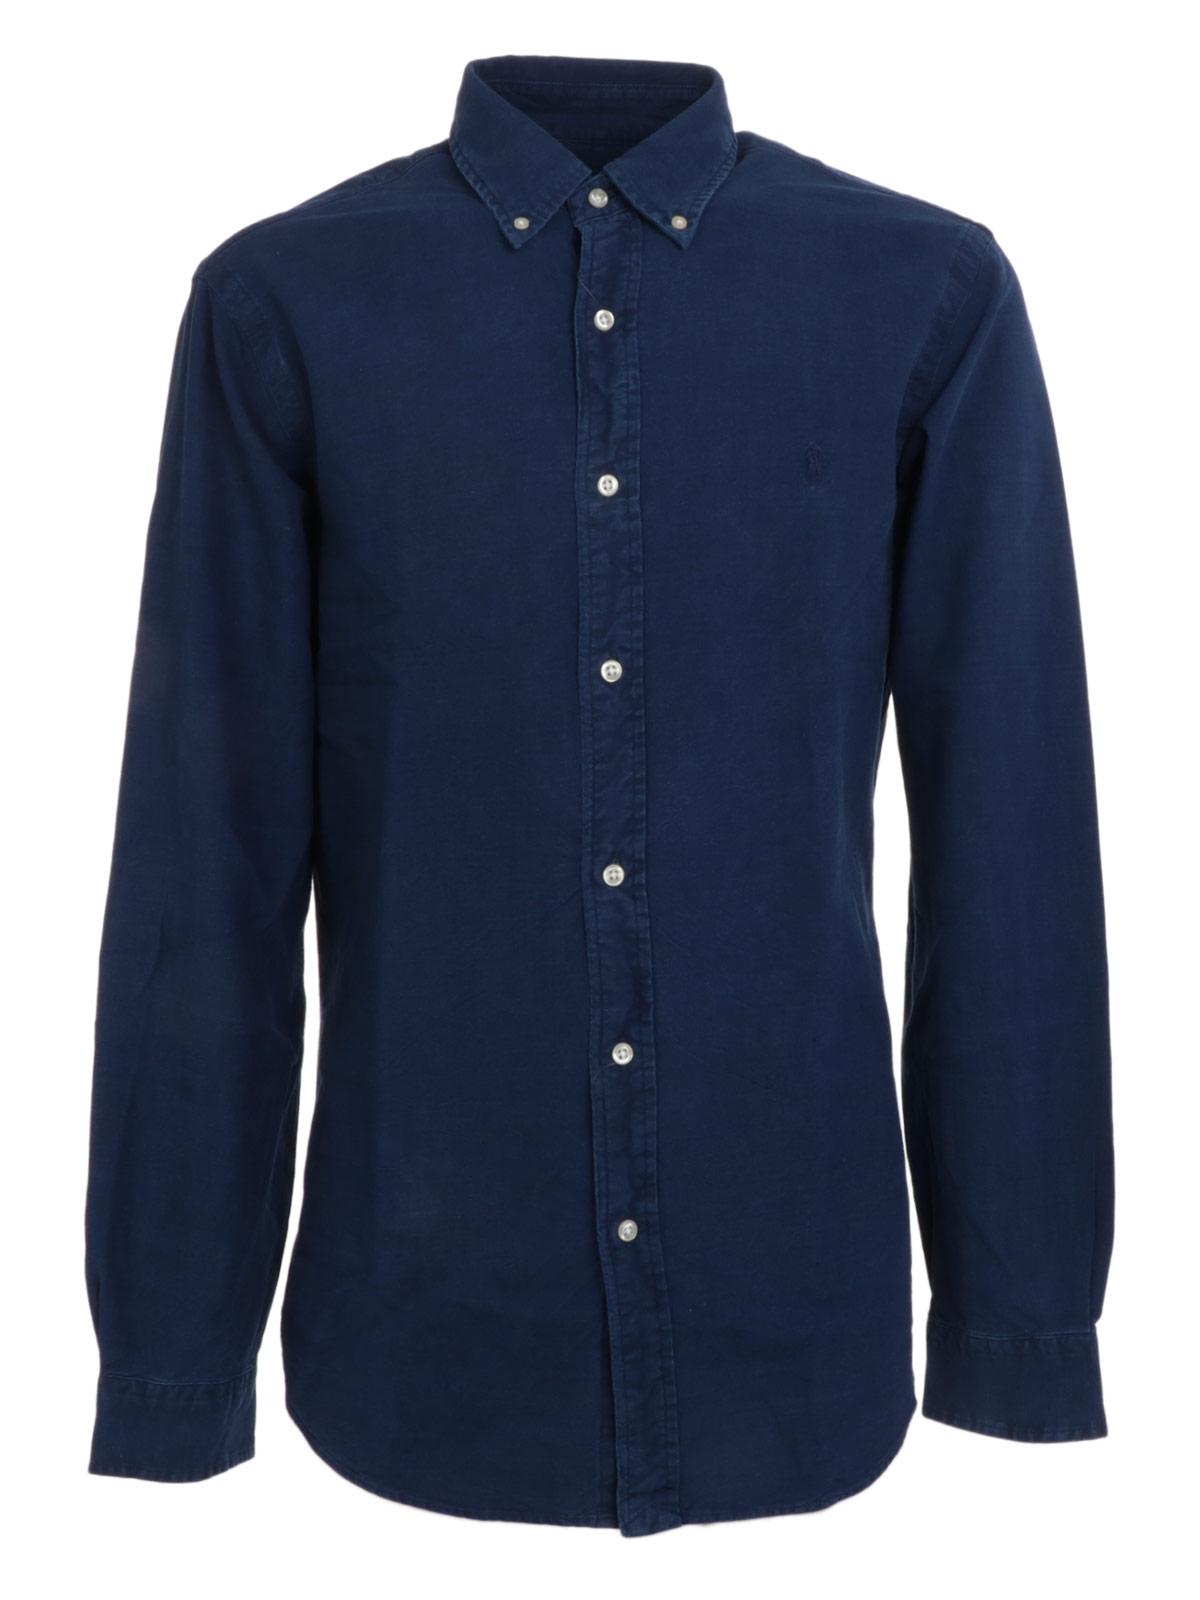 Picture of POLO RALPH LAUREN | Men's Denim Effect Shirt